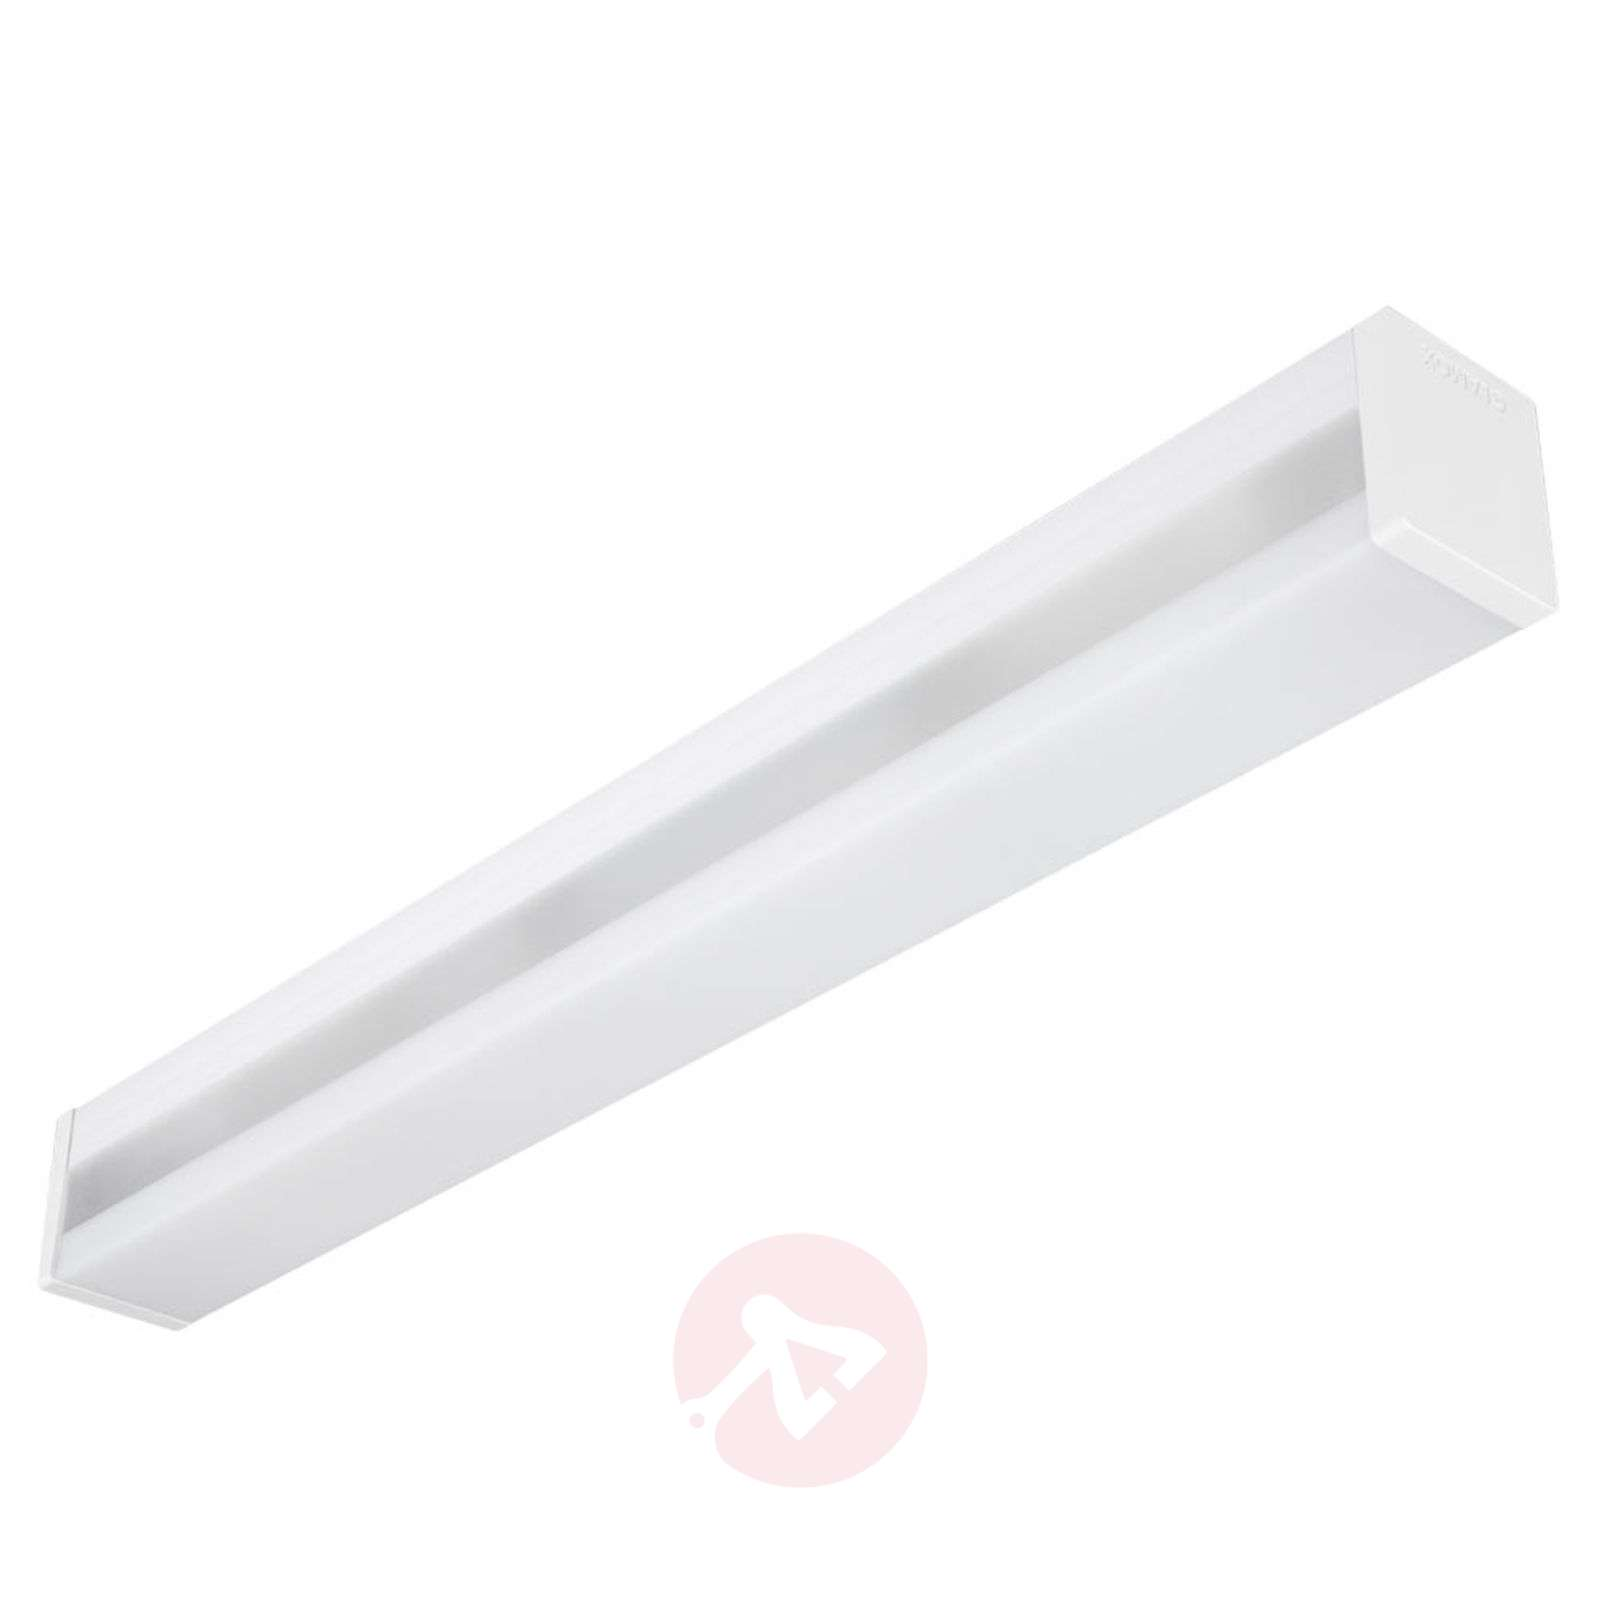 Peililamppu A40-W600 LED 1400HF 840 m. LED 60 cm-6040209-01